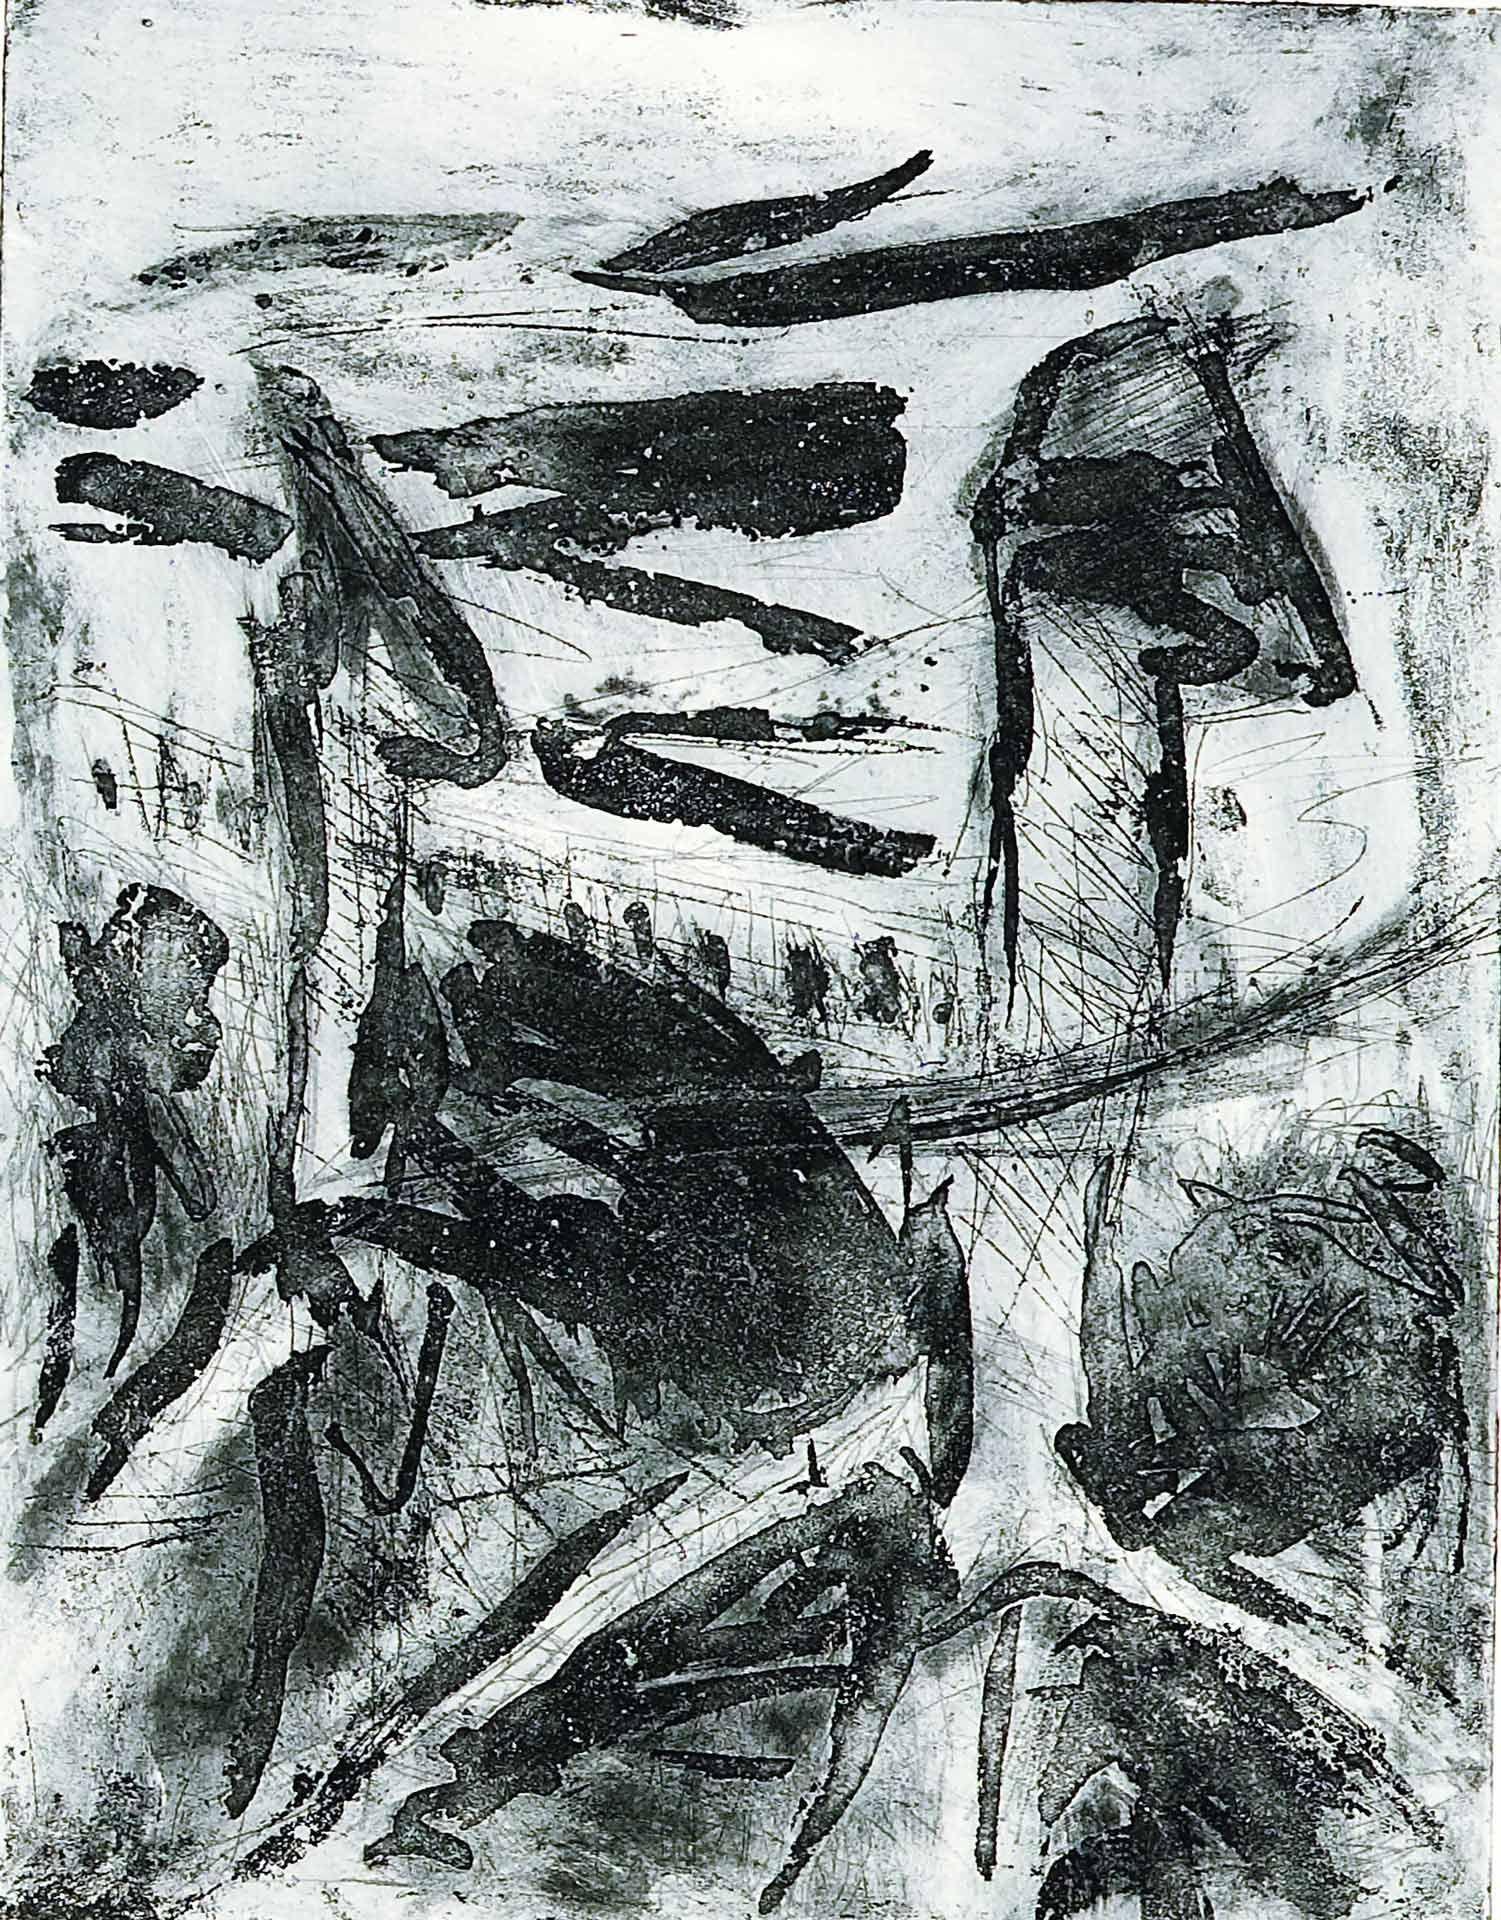 Georg Baselitz (born in 1938), Untitled (Tree), 1977/1980, drypoint, aquatint. MMFA, gift of Hilliard T. Goldfarb in honour of Renata and Michal Hornstein. © Georg Baselitz 2020